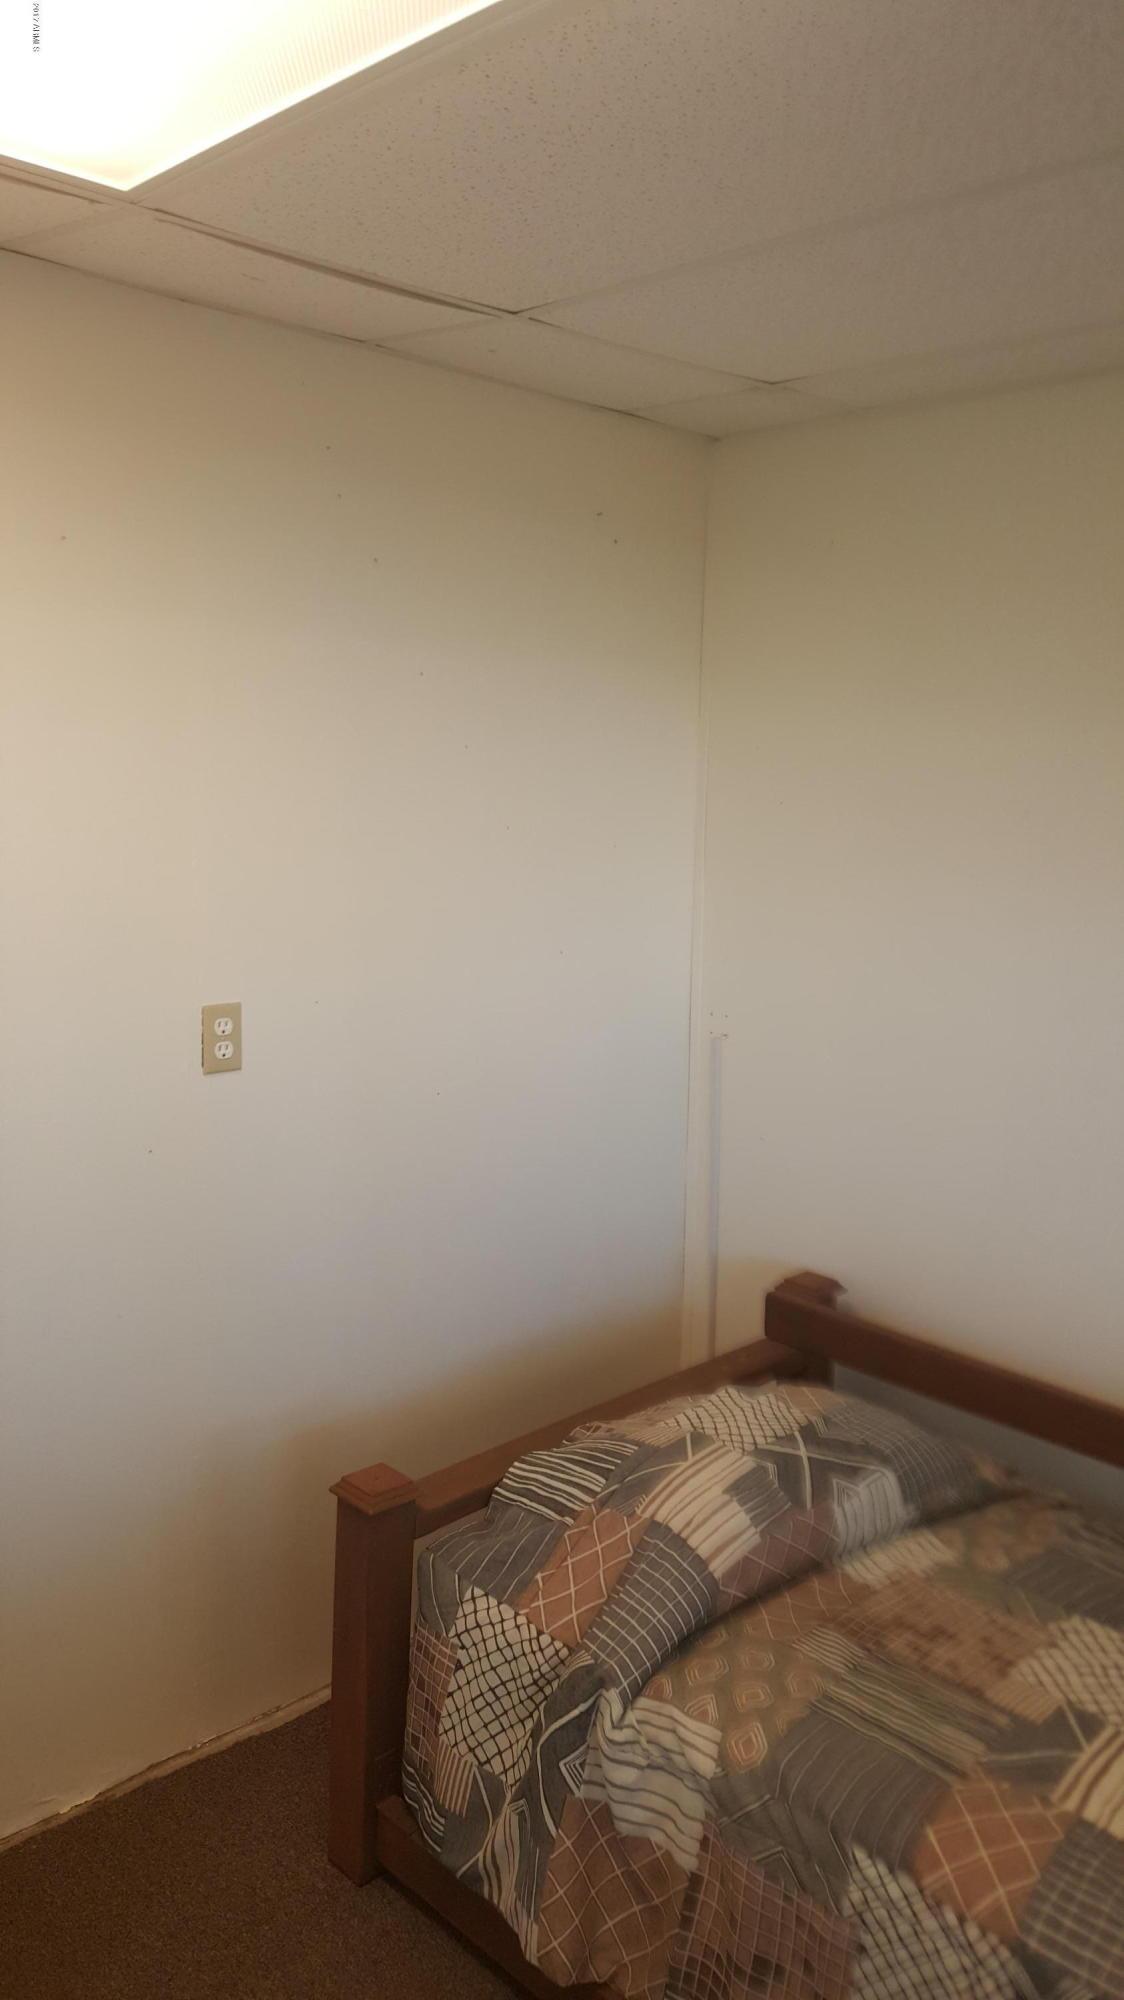 117 E MESQUITE Drive Florence, AZ 85132 - MLS #: 5622223